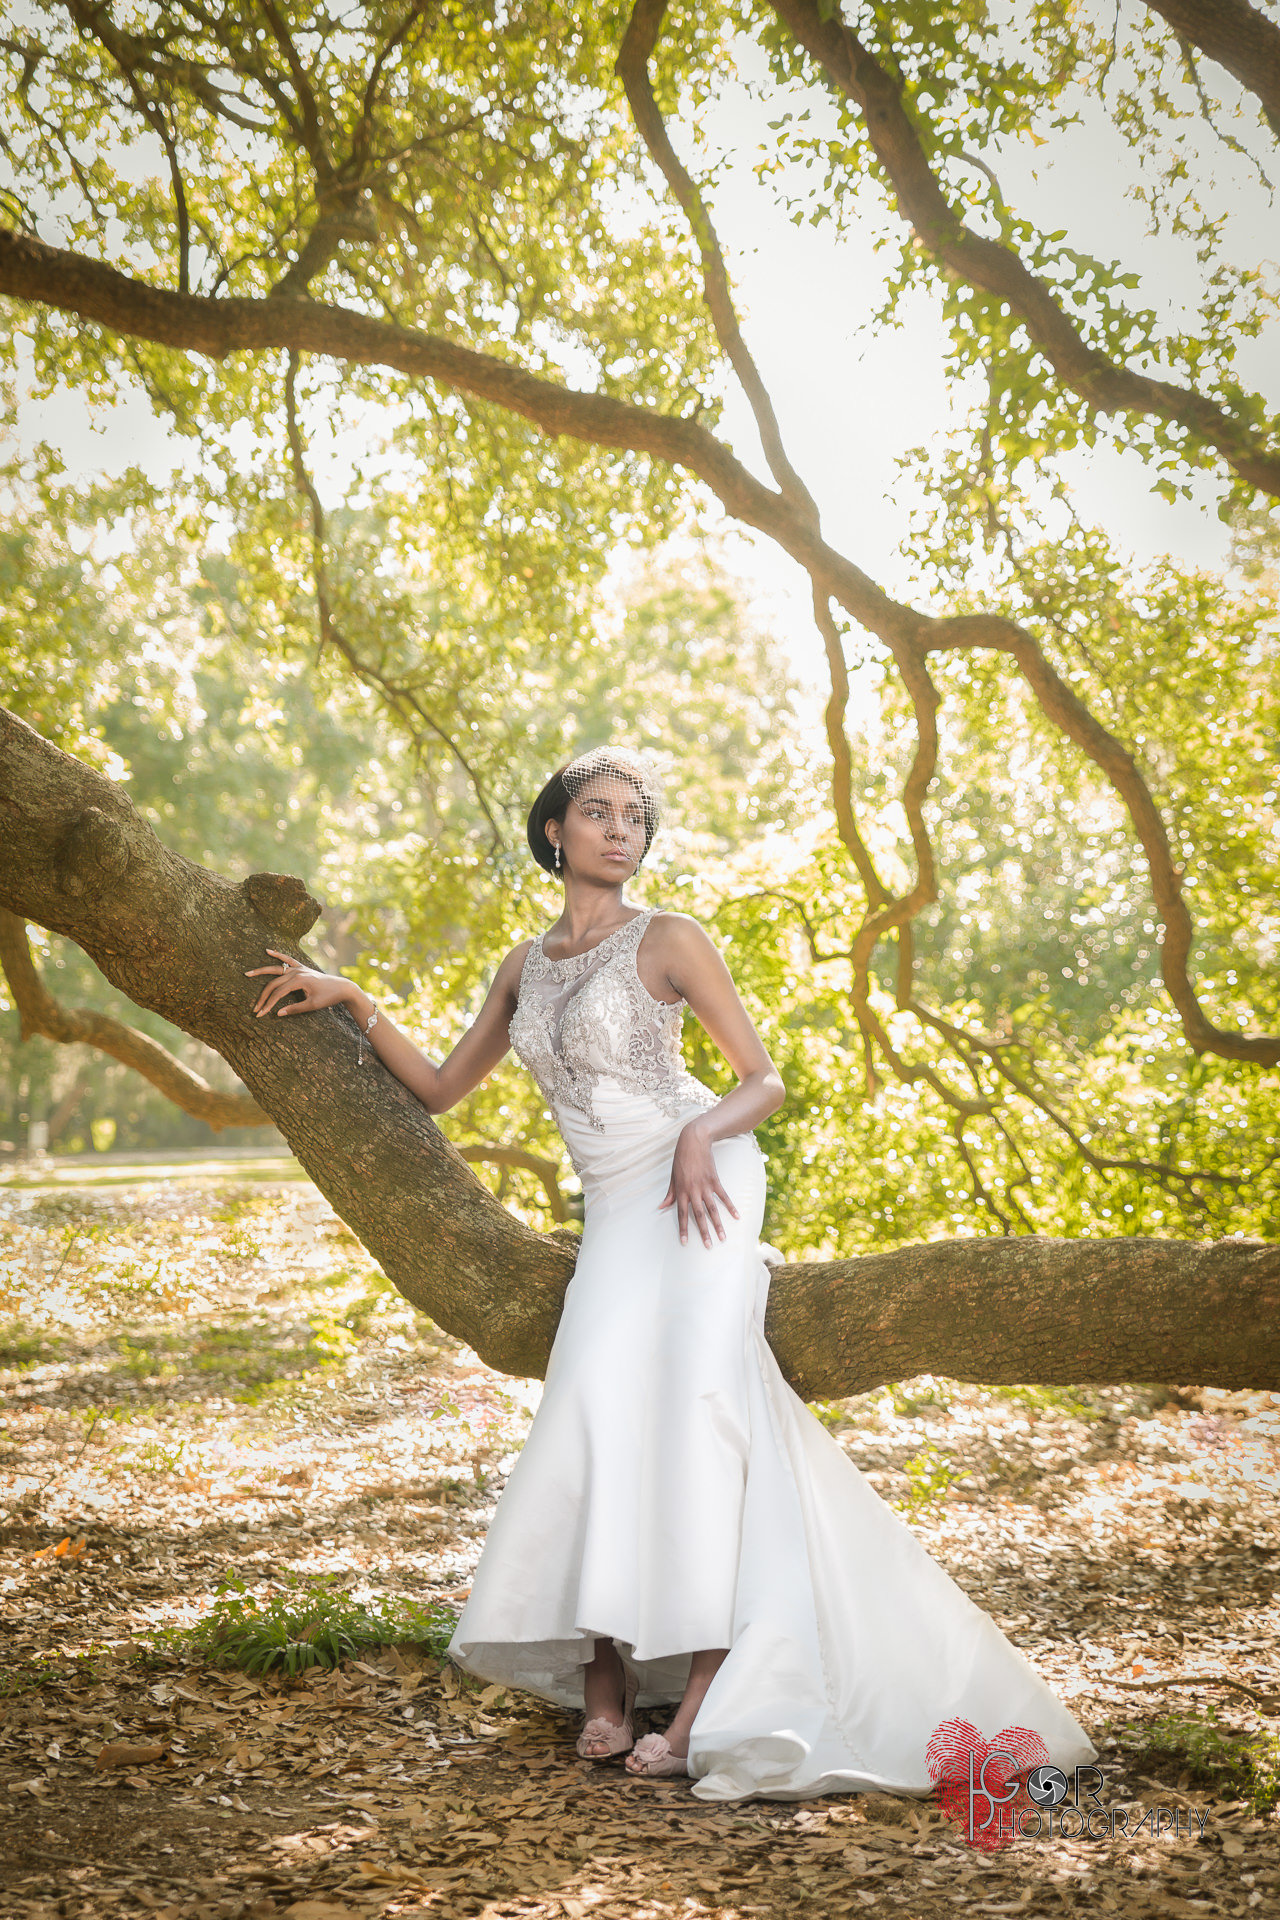 bridal-nola-greer-06934.jpg